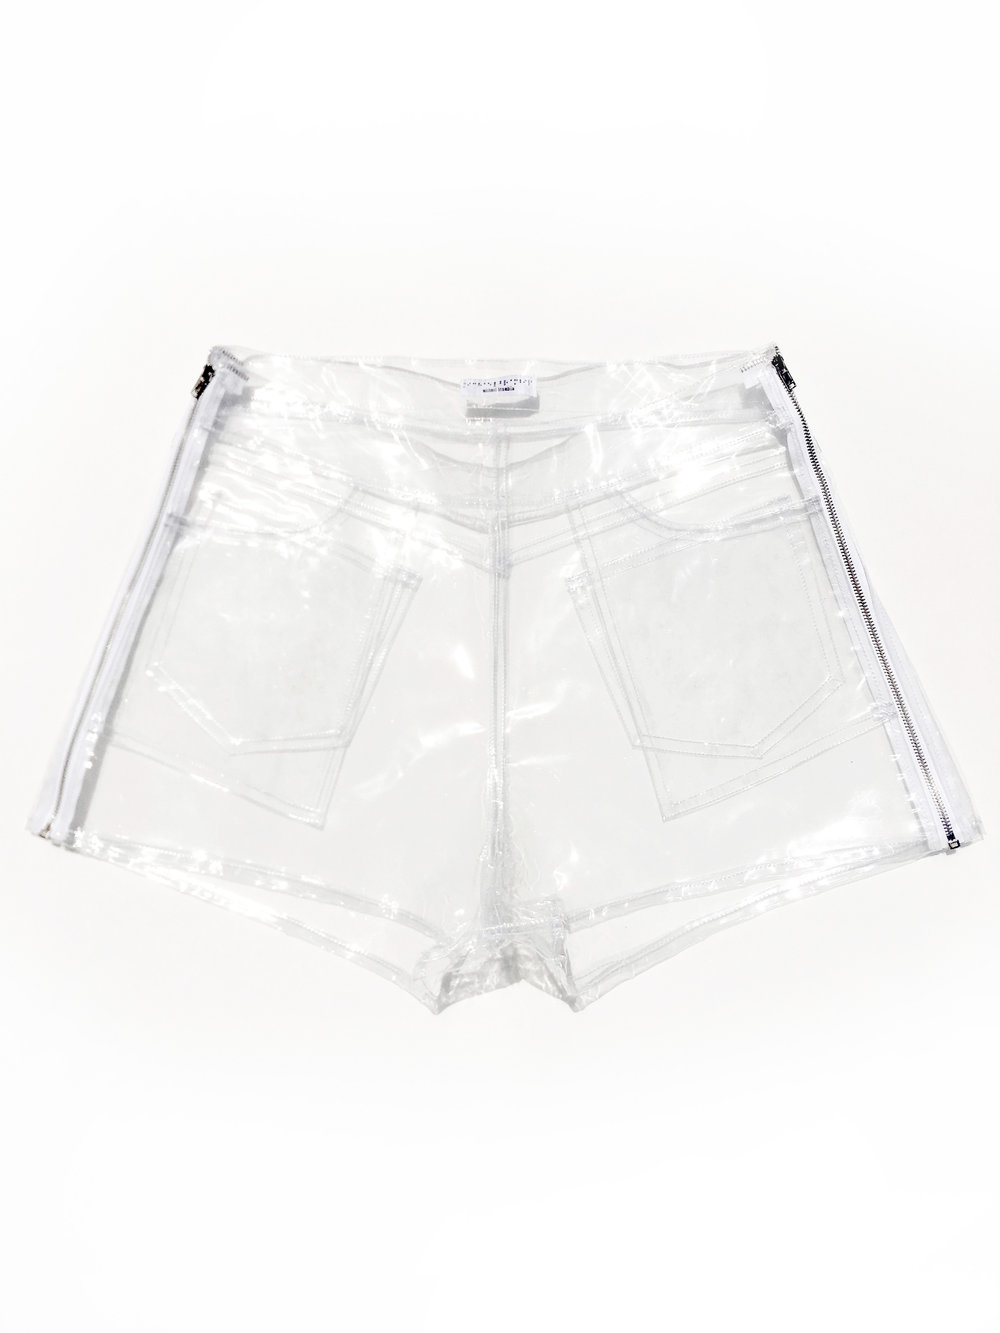 picture freeuse Plastic vinyl michael brambila. Transparent shorts clear